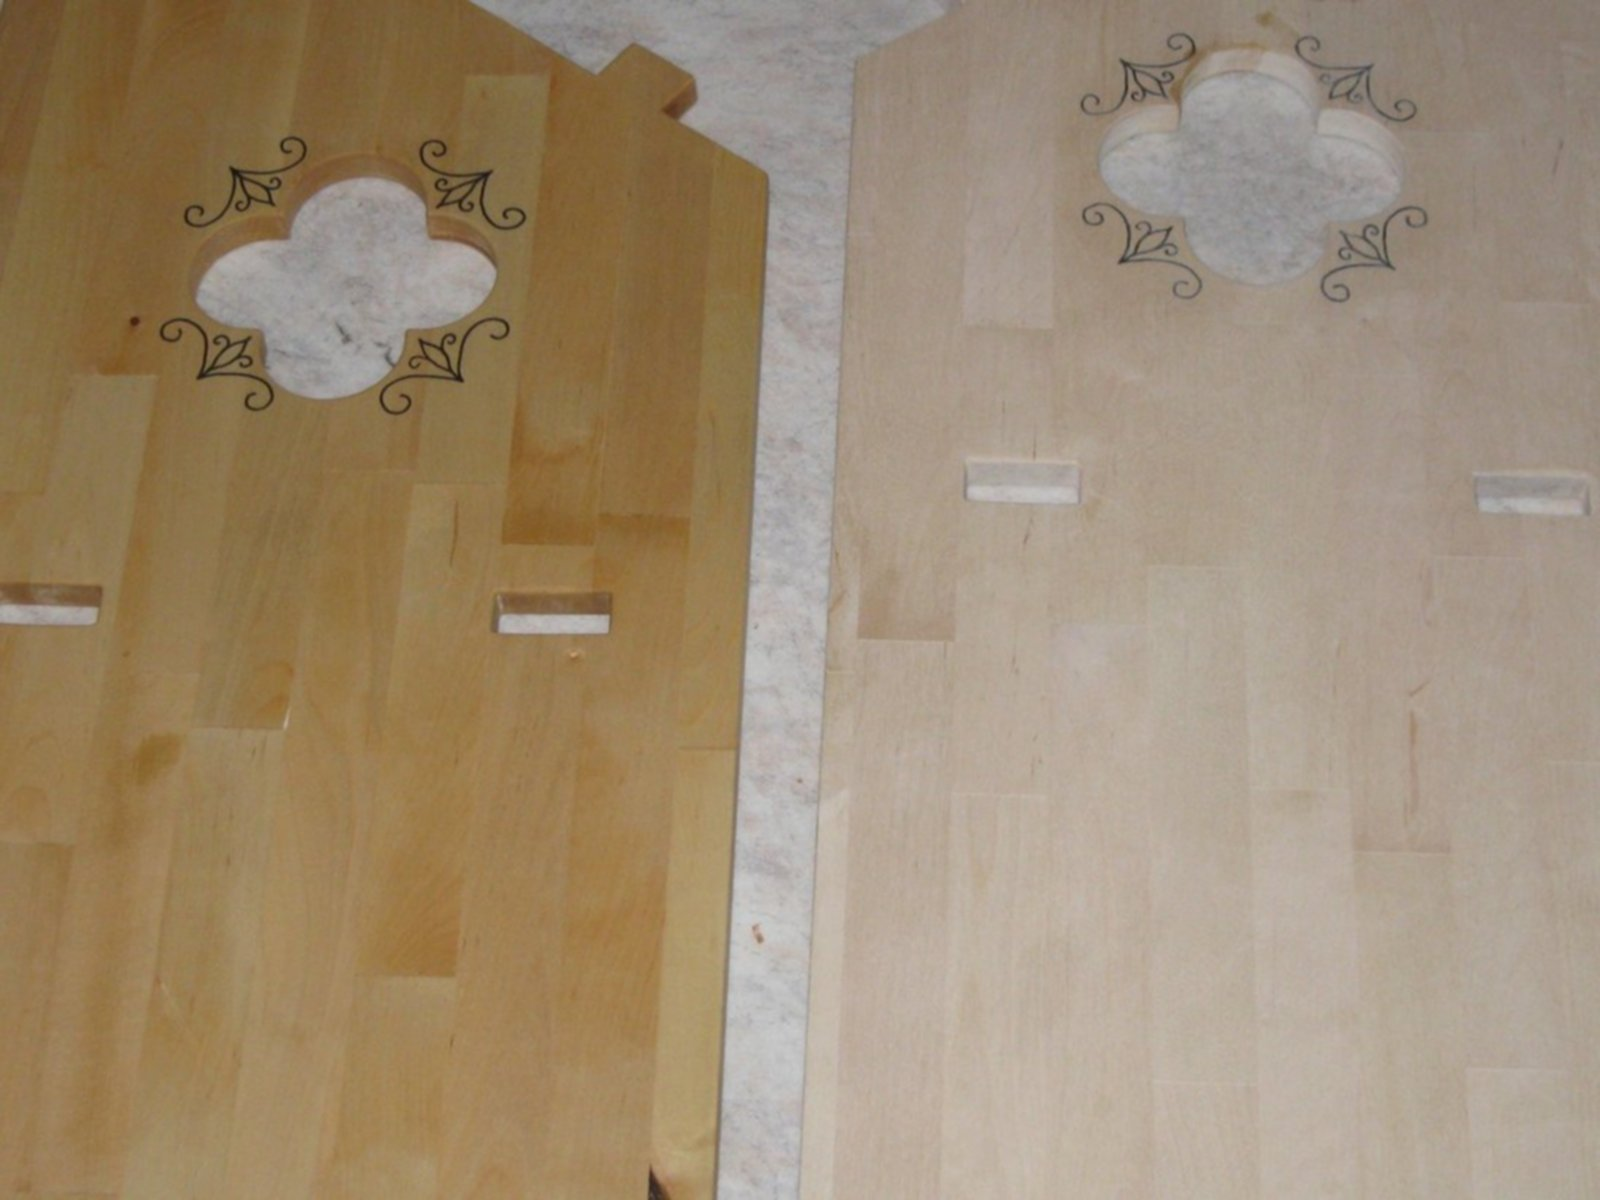 scriptorium romani m bel schreibpult. Black Bedroom Furniture Sets. Home Design Ideas